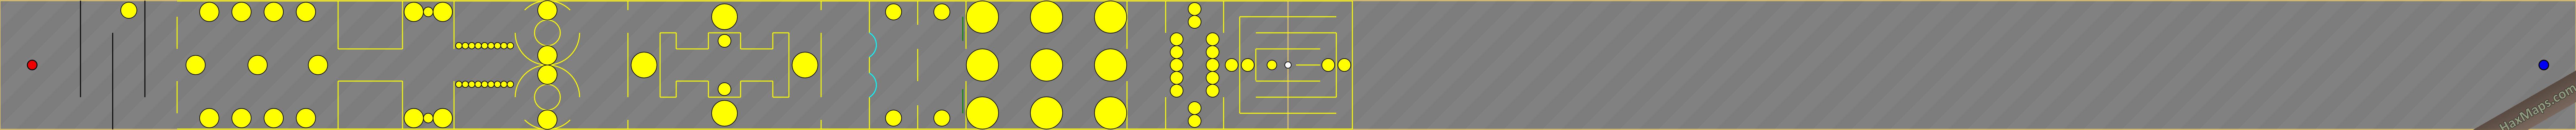 hax ball maps   Yellow Ball Xtreme by Galactic Boy